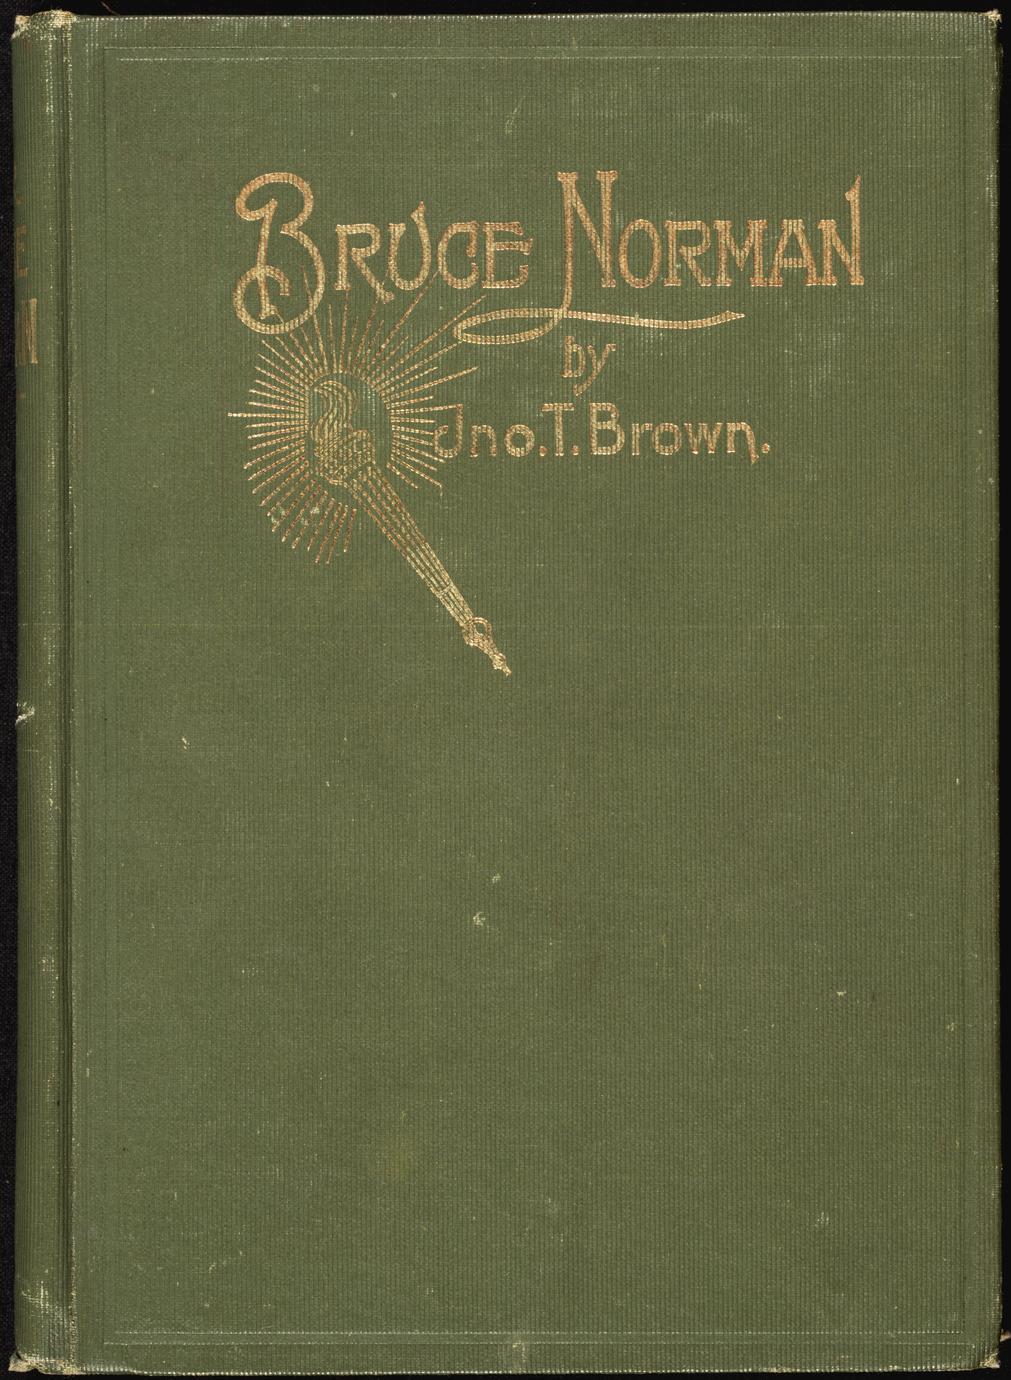 Bruce Norman : a novel (1 of 2)